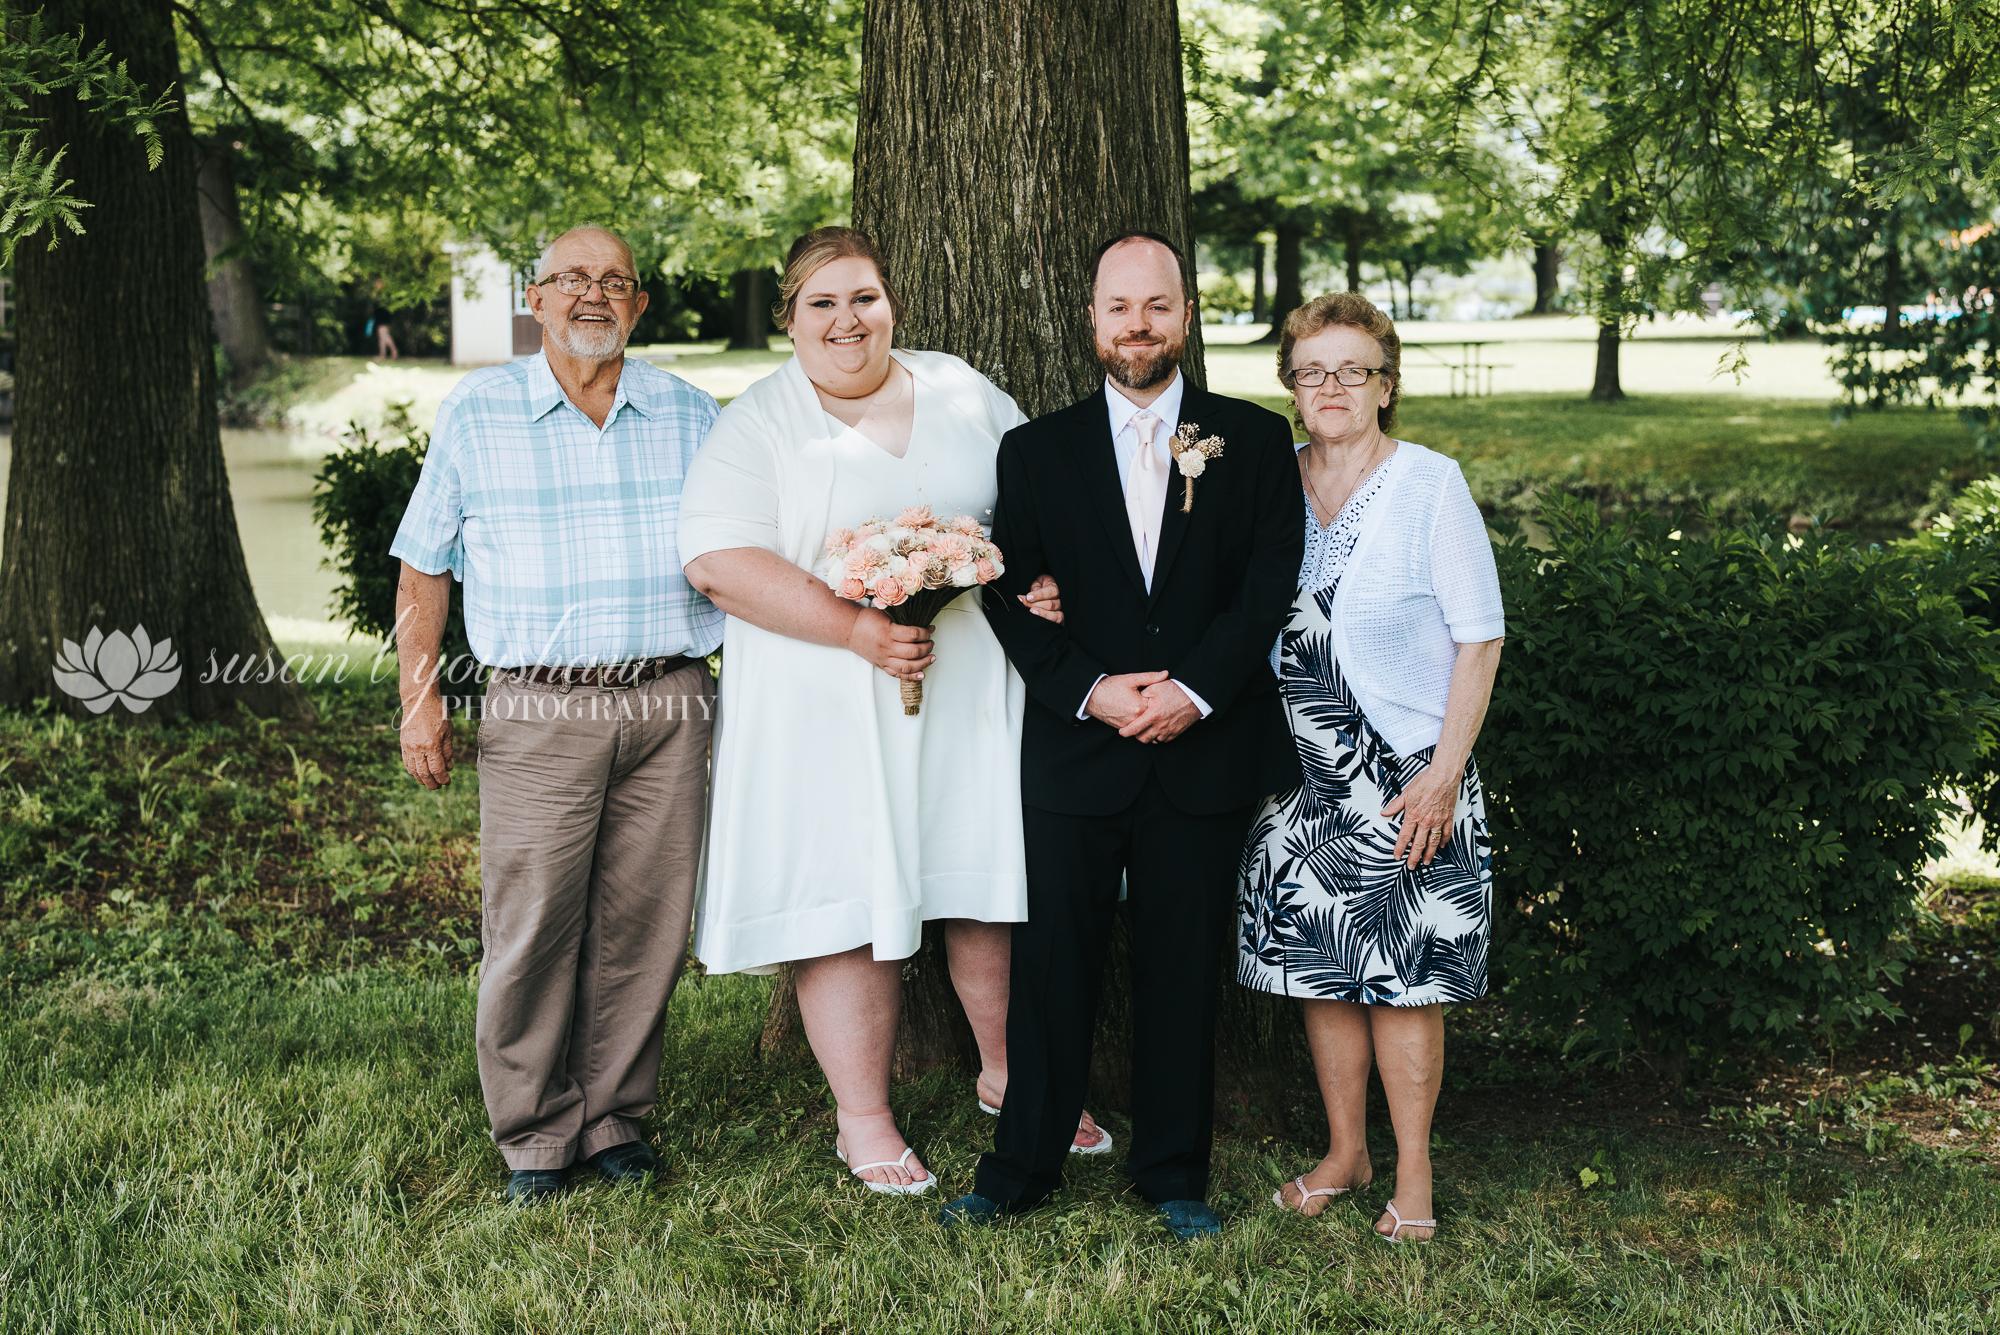 Bill and Sarah Wedding Photos 06-08-2019 SLY Photography -51.jpg